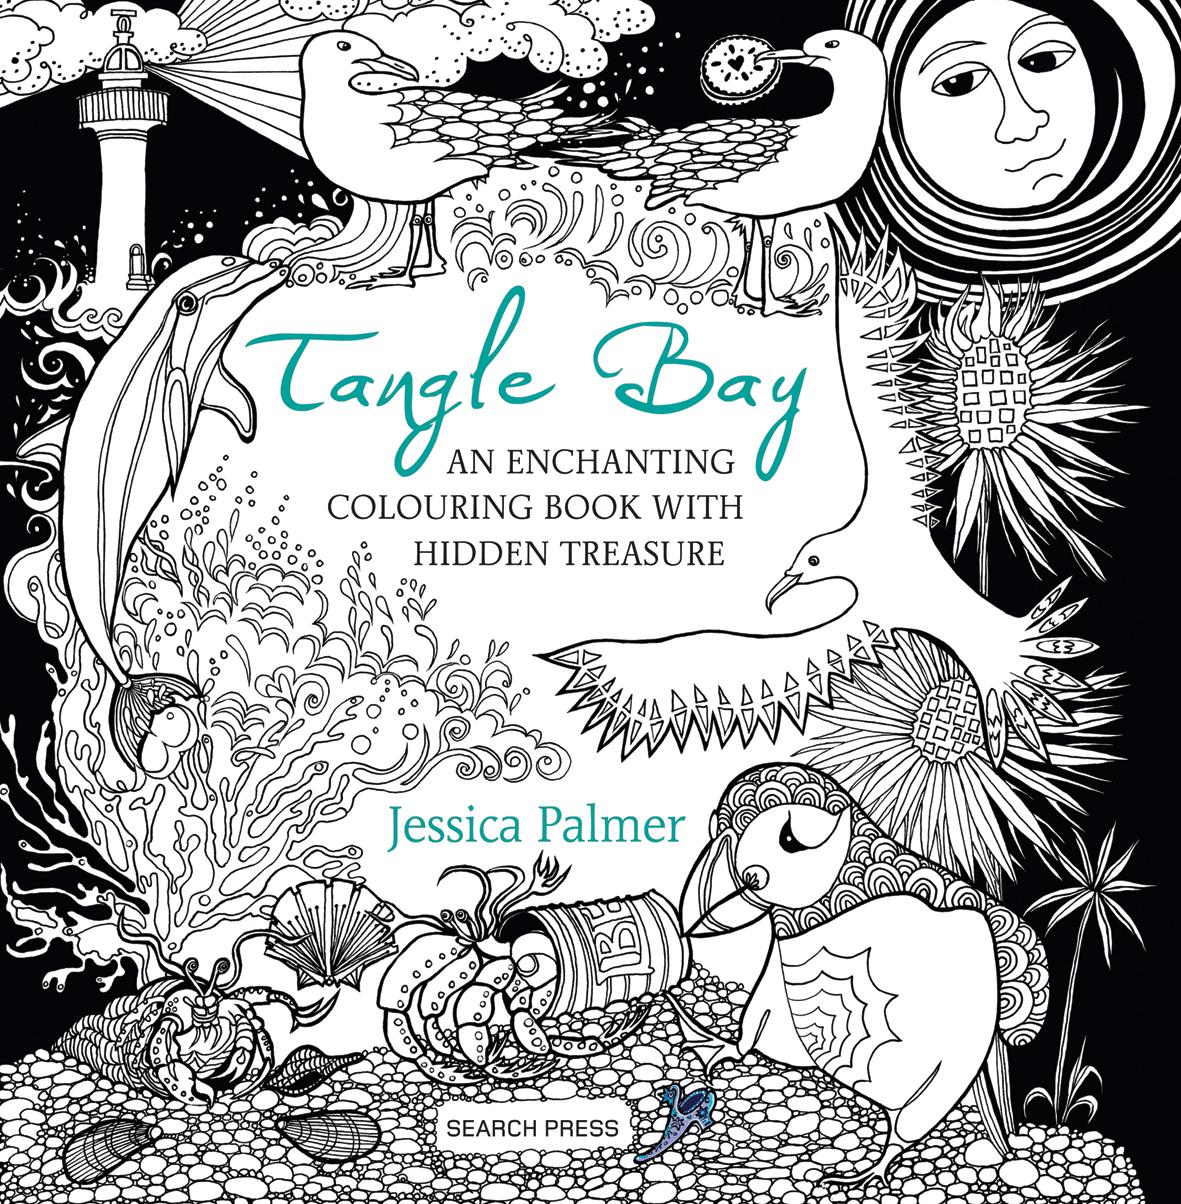 Watercolor books by search press - Tangle Bay